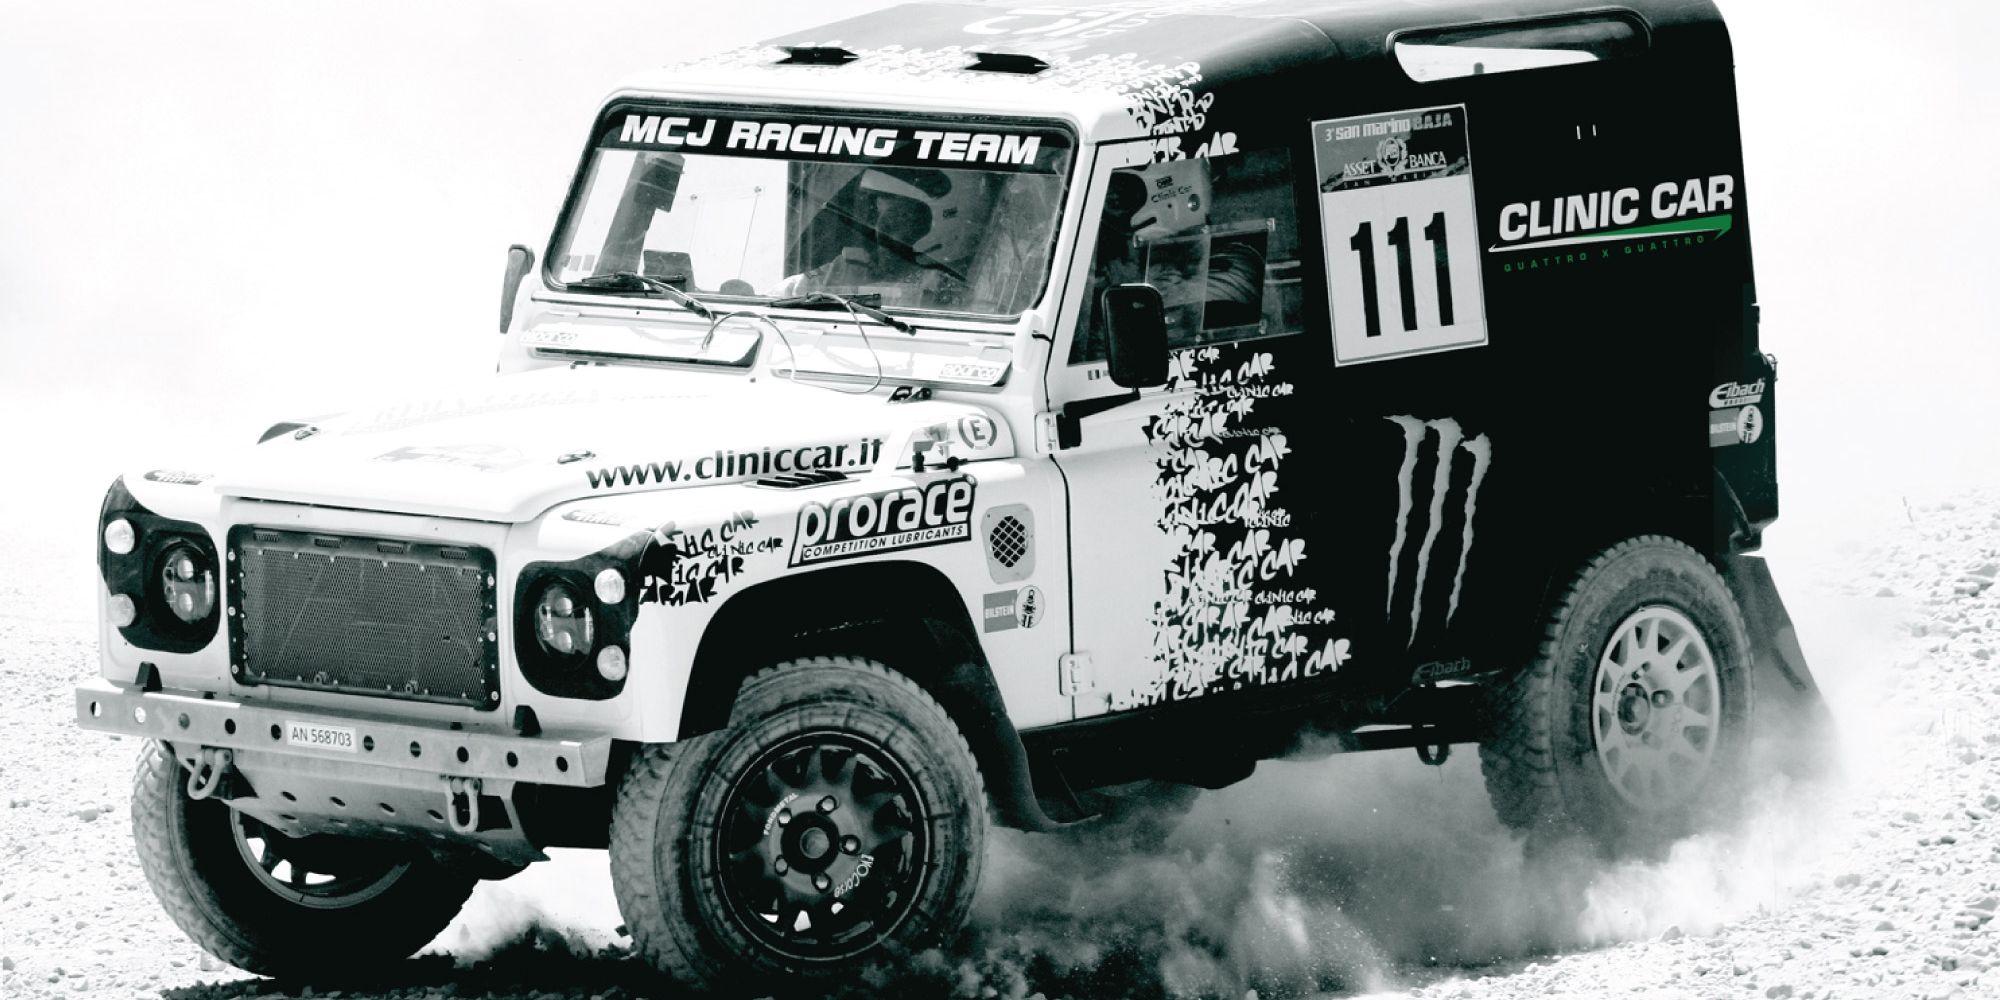 Clinic Car - Officina autorizzata Land Rover